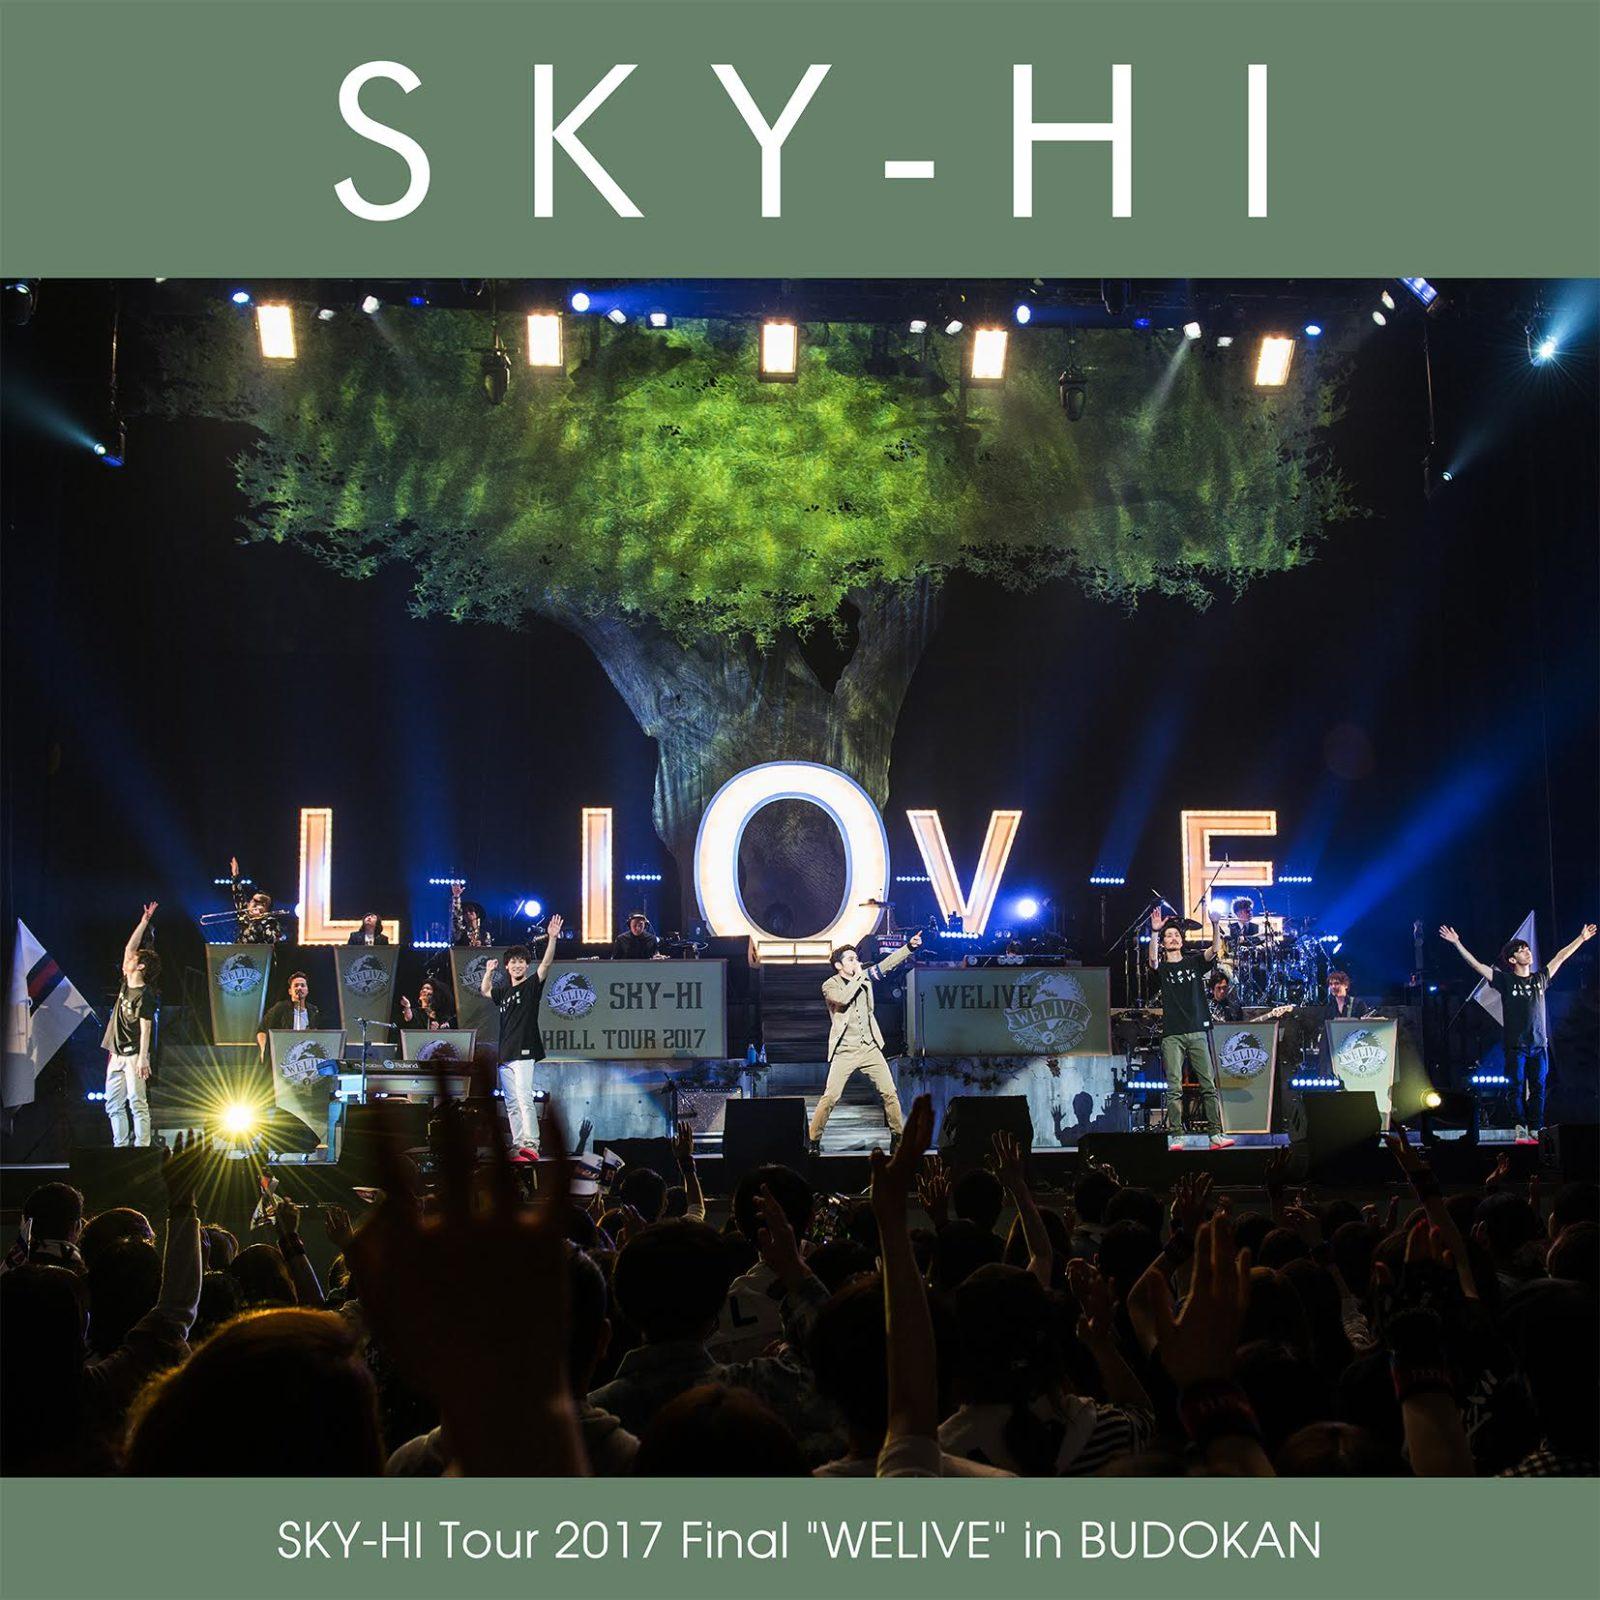 SKY-HI LIVE映像「カミツレベルベット」公開 & LIVE音源先行配信開始!サムネイル画像